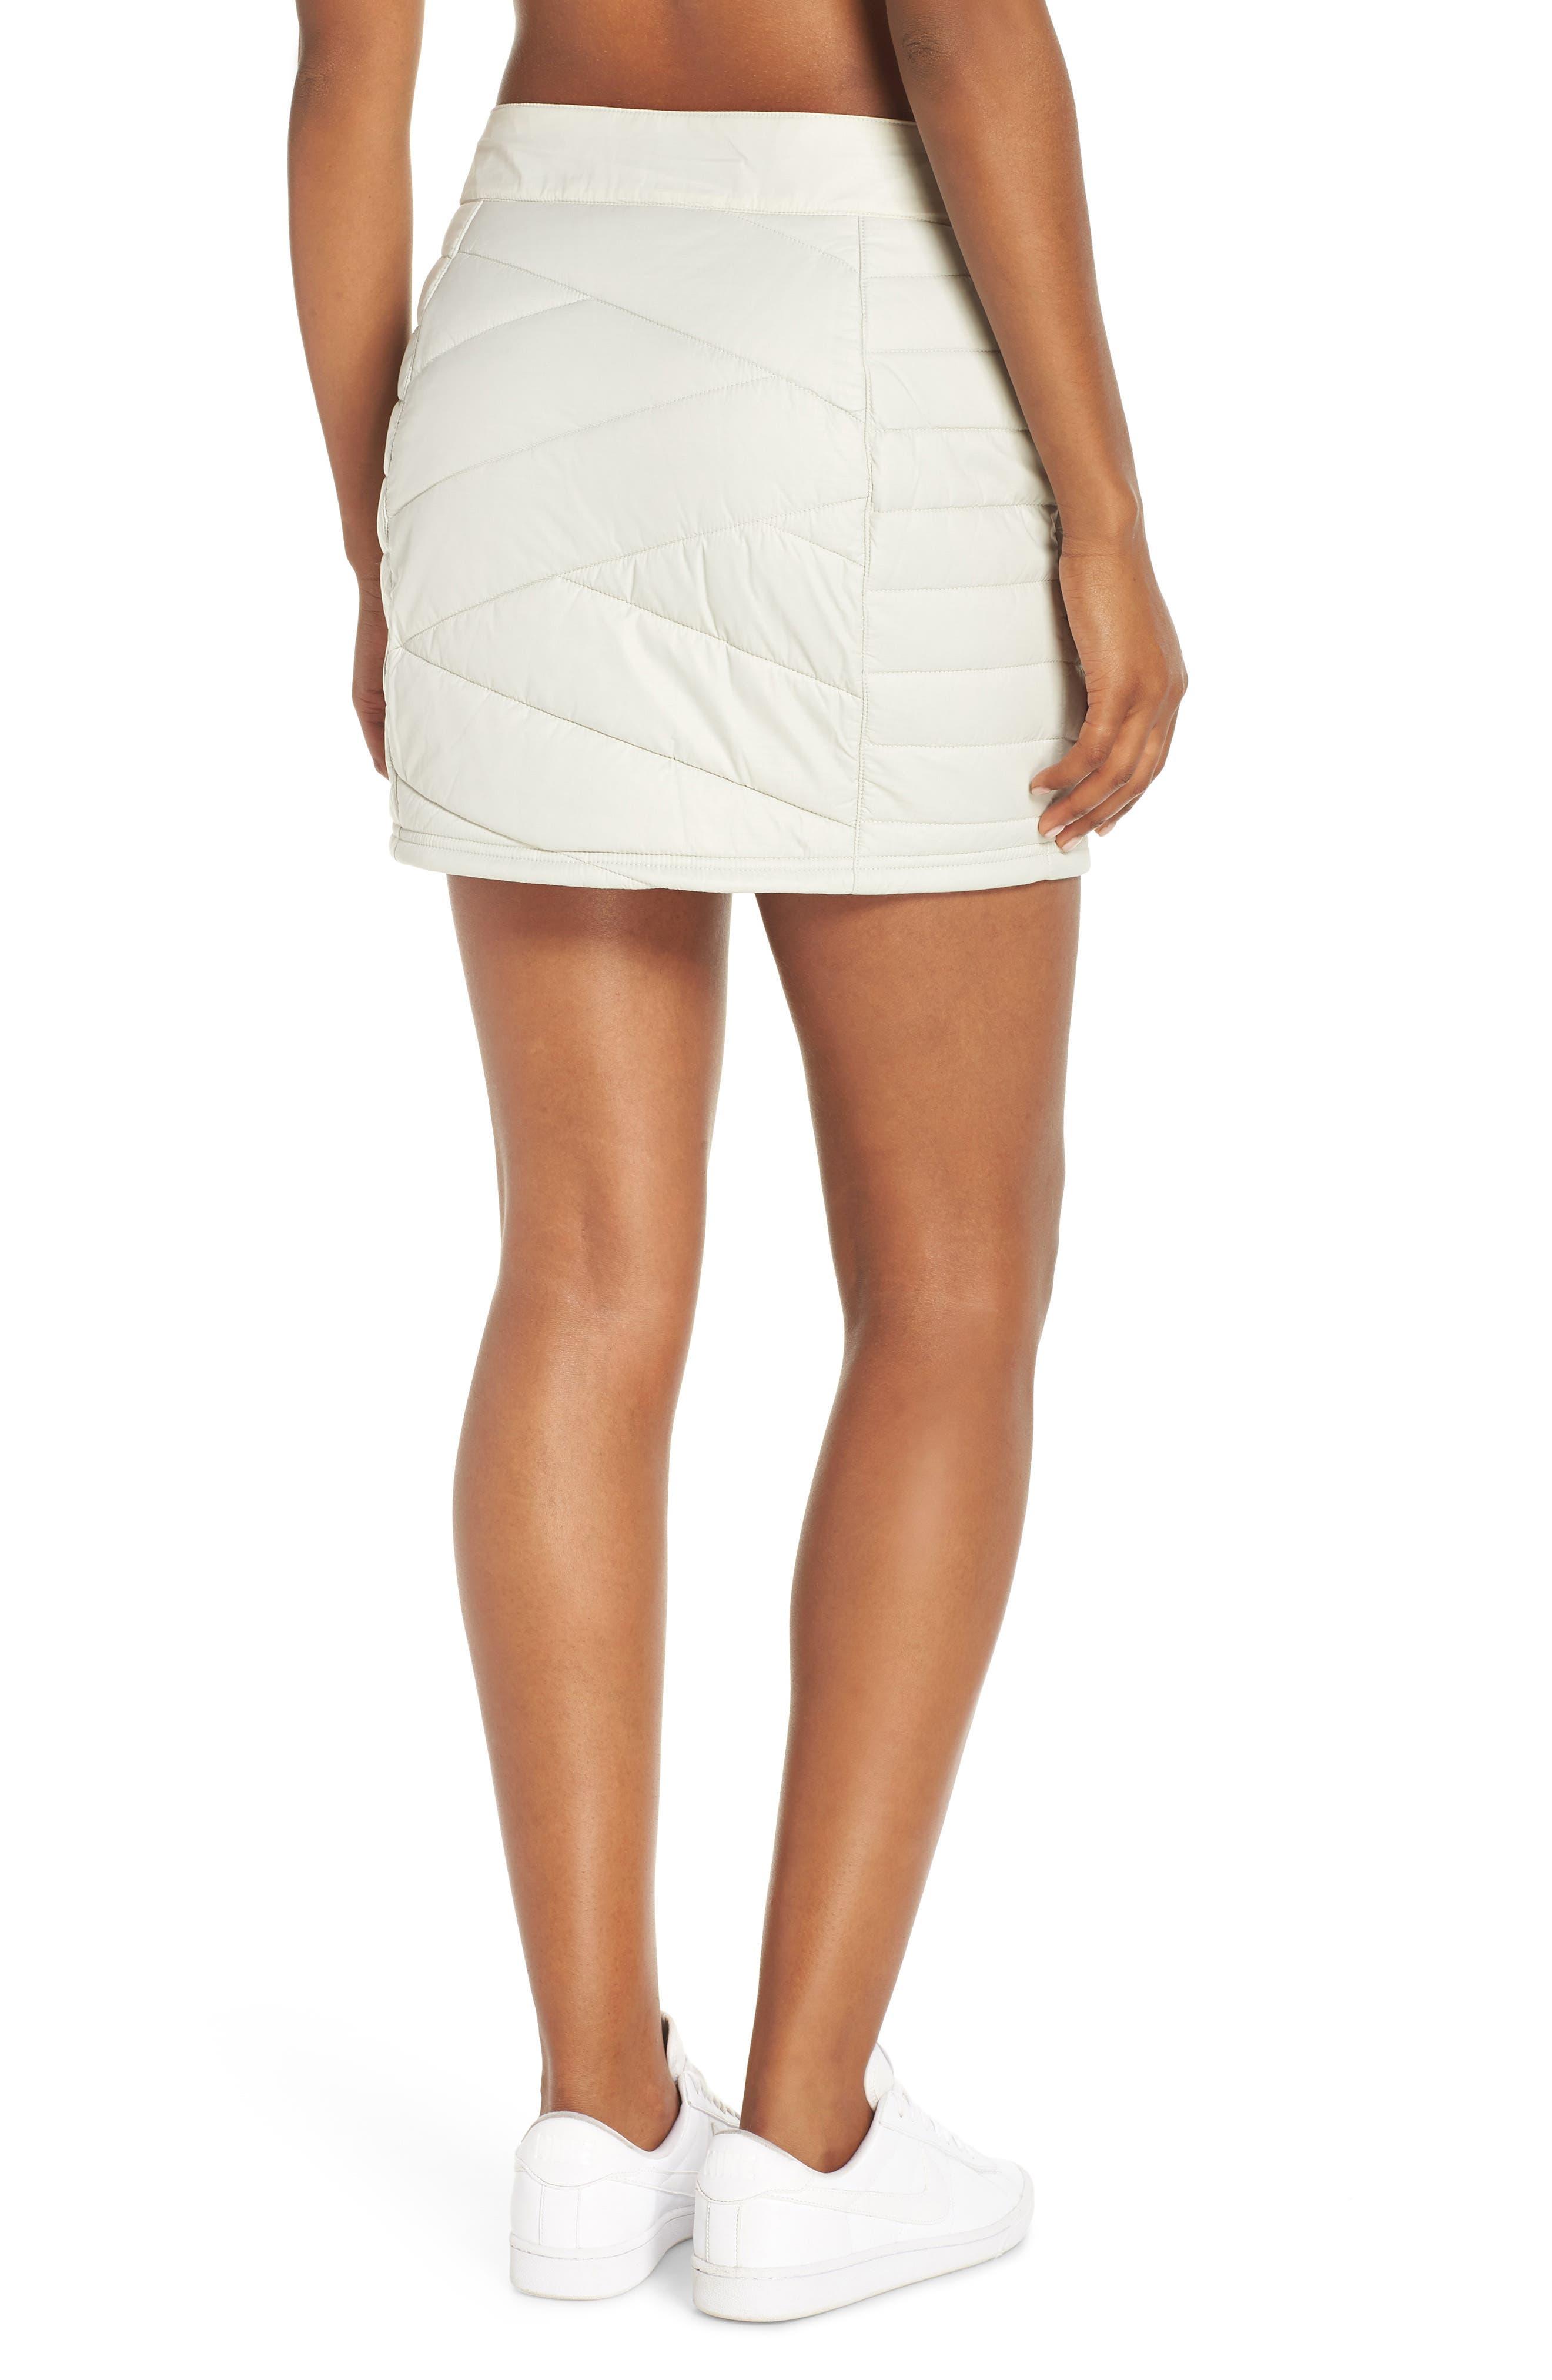 SMARTWOOL,                             Smartloft 120 Quilted Skirt,                             Alternate thumbnail 2, color,                             025